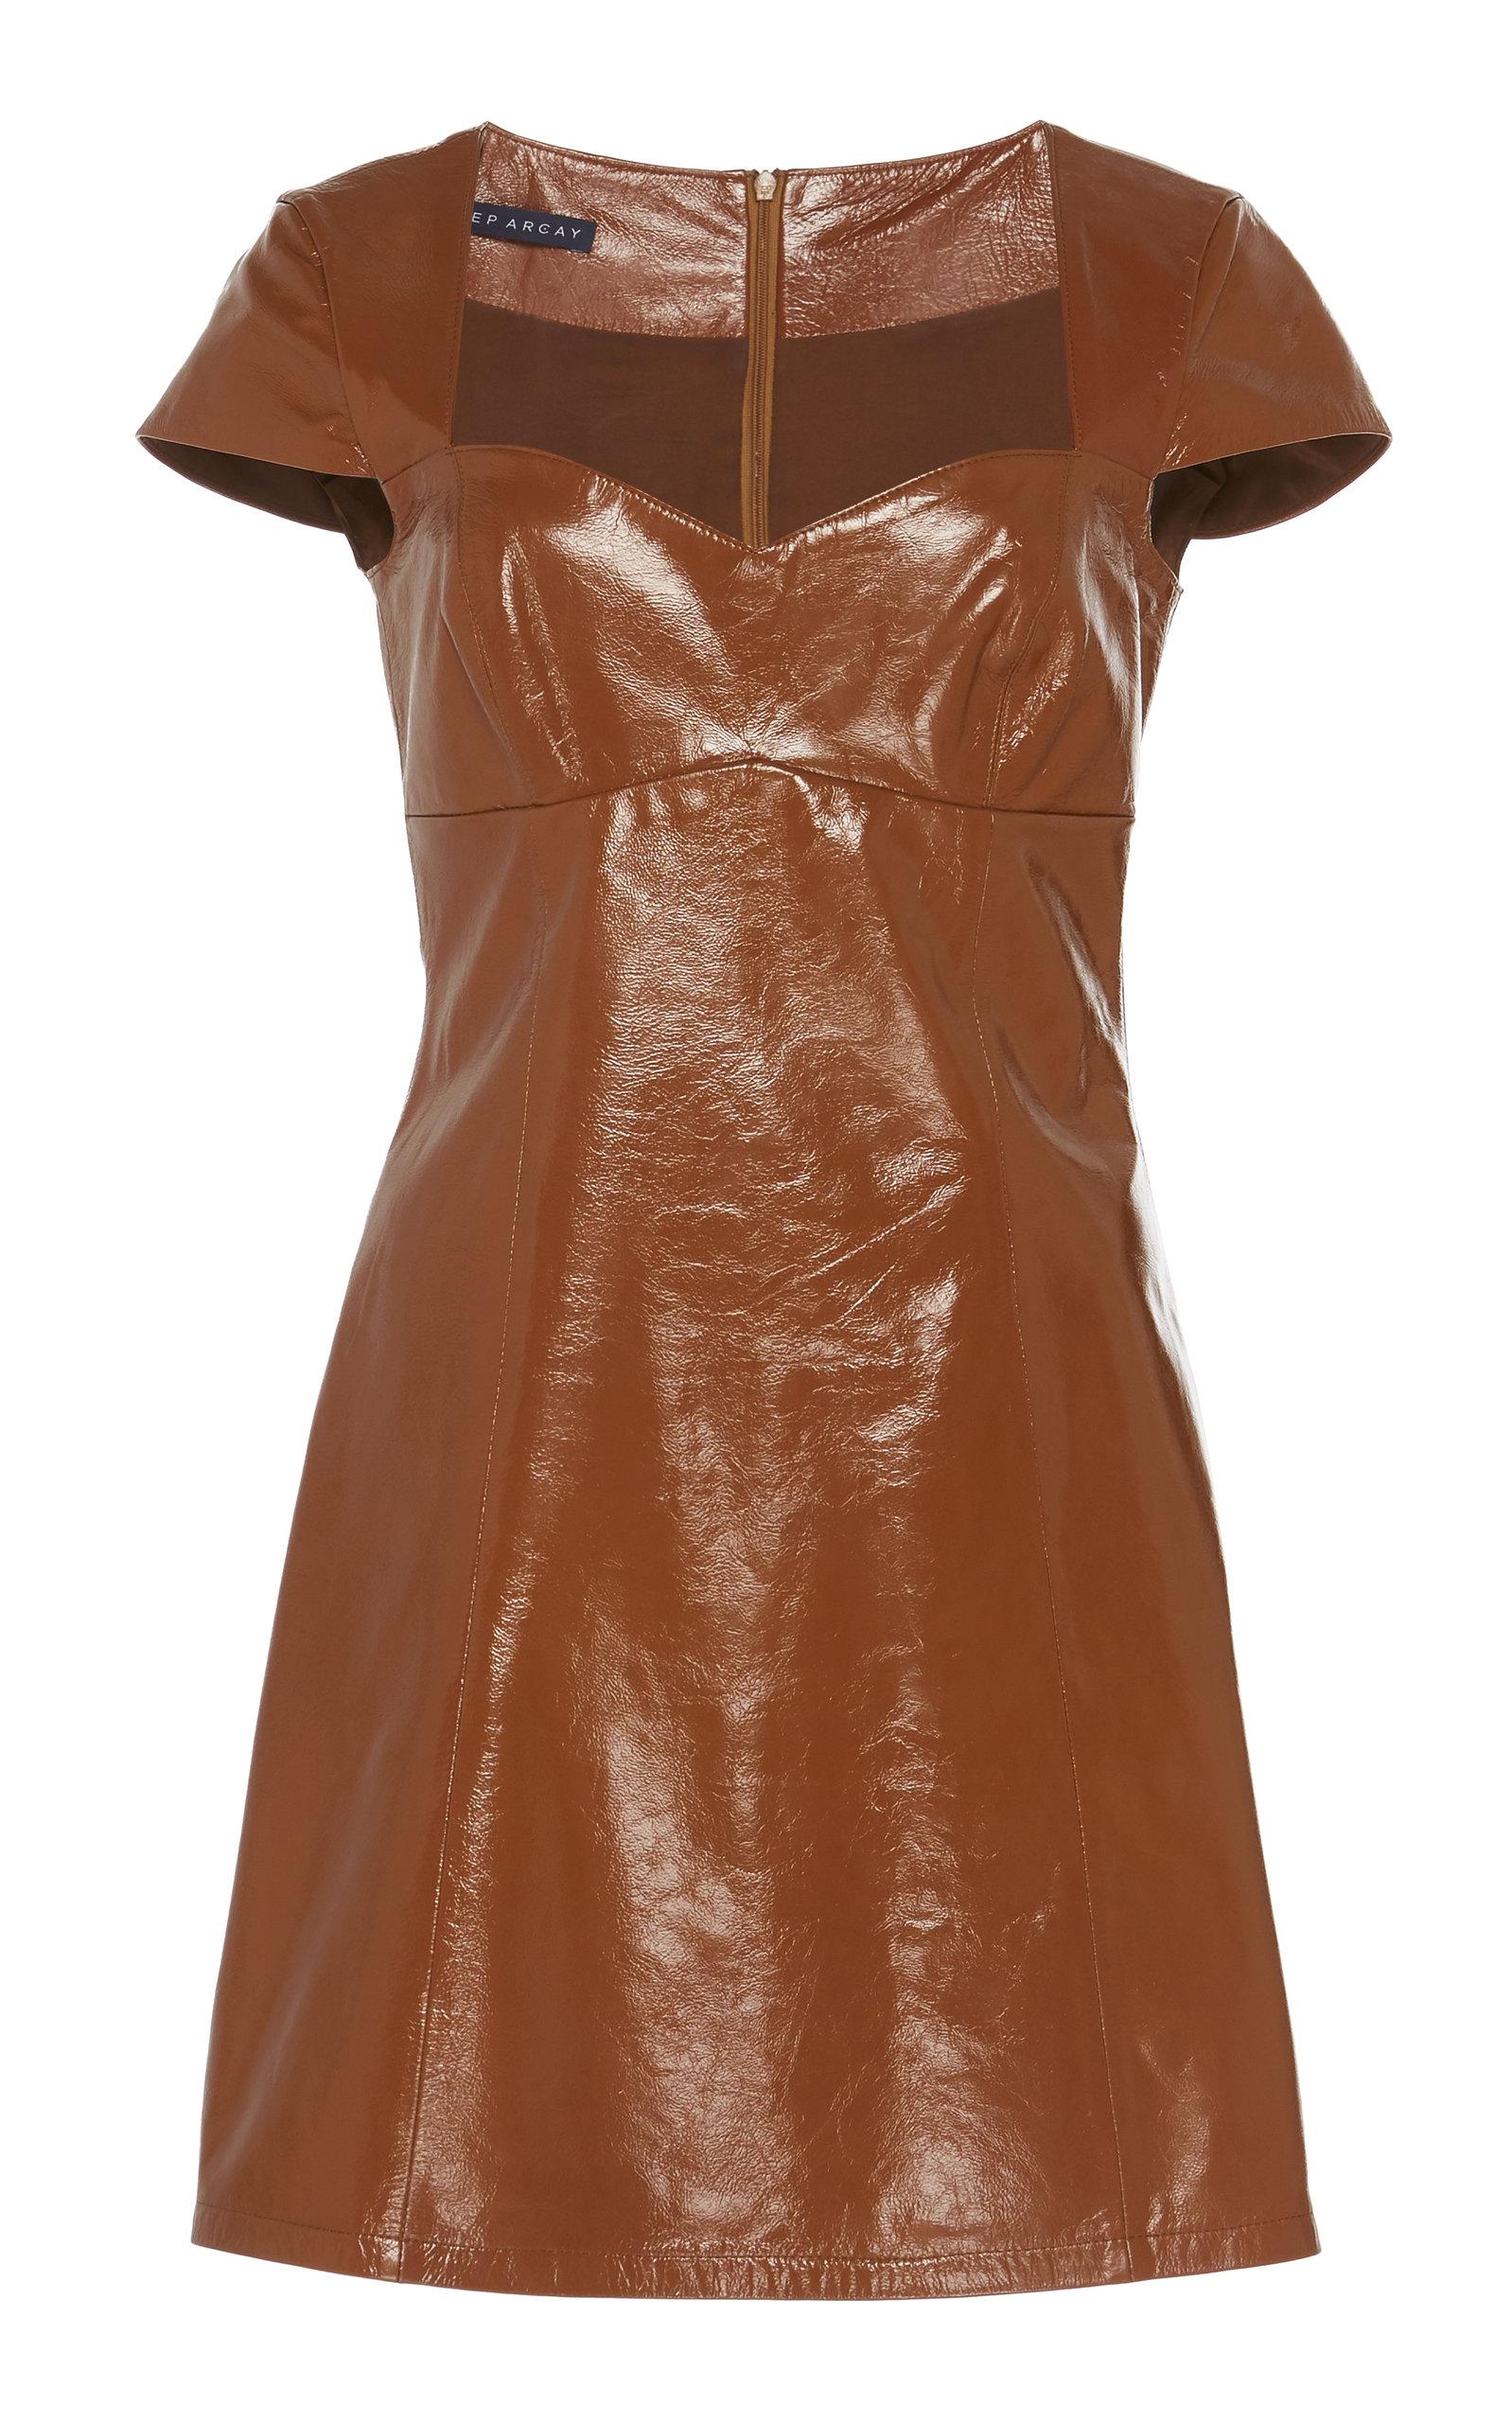 Buy Zeynep Arçay Patent Leather Mini Dress online, shop Zeynep Arçay at the best price